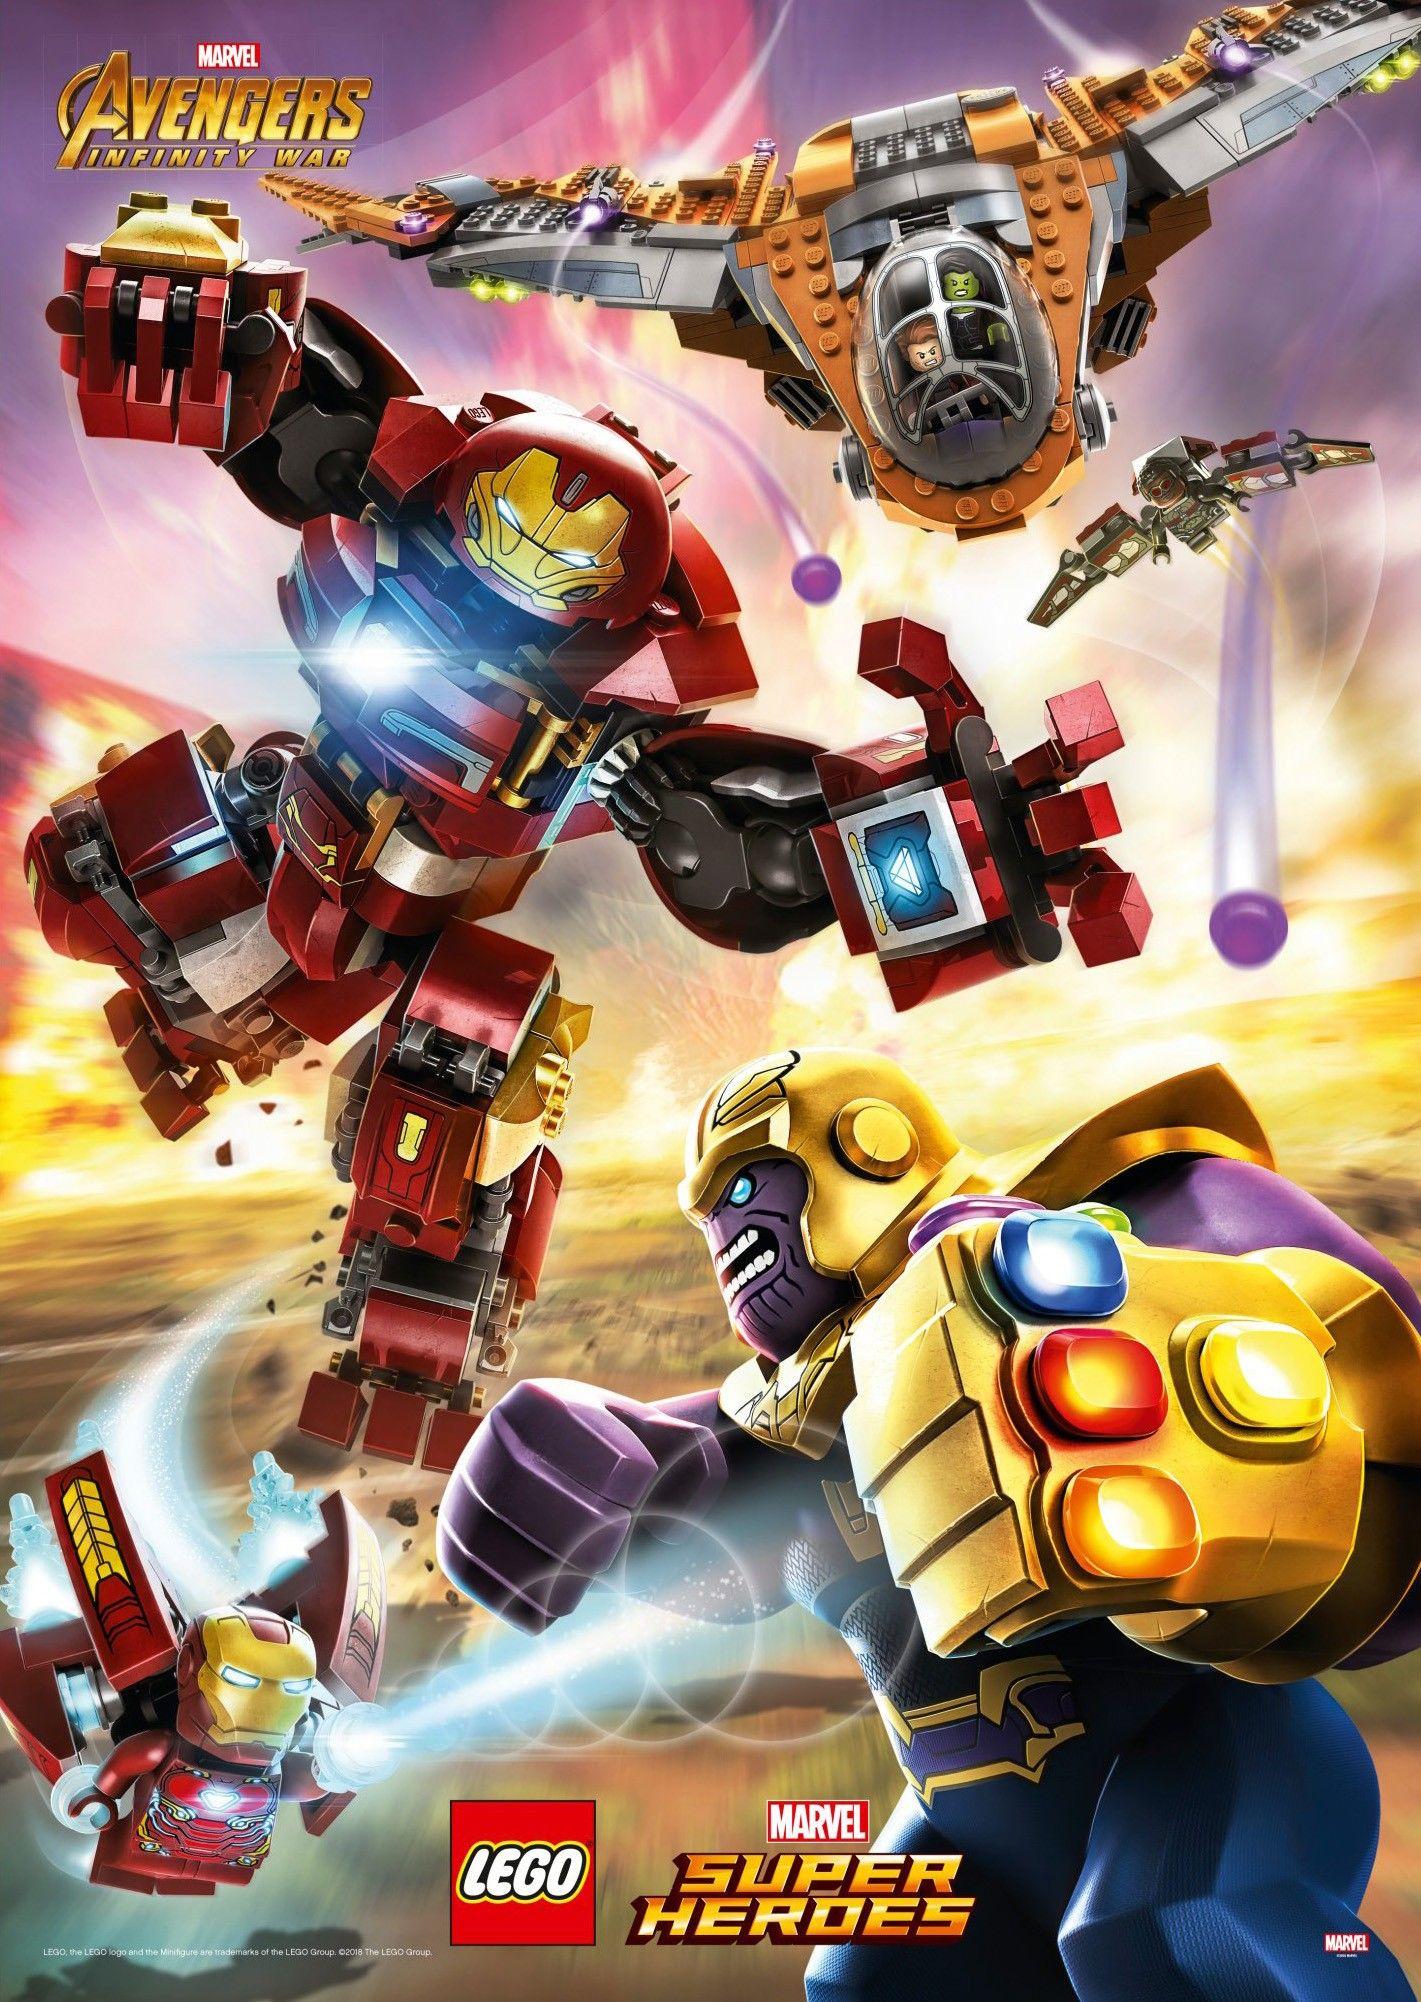 Marvel's WarMarvelDbz Lego 10 And Ben Avengers Infinity kXTiwOZPu